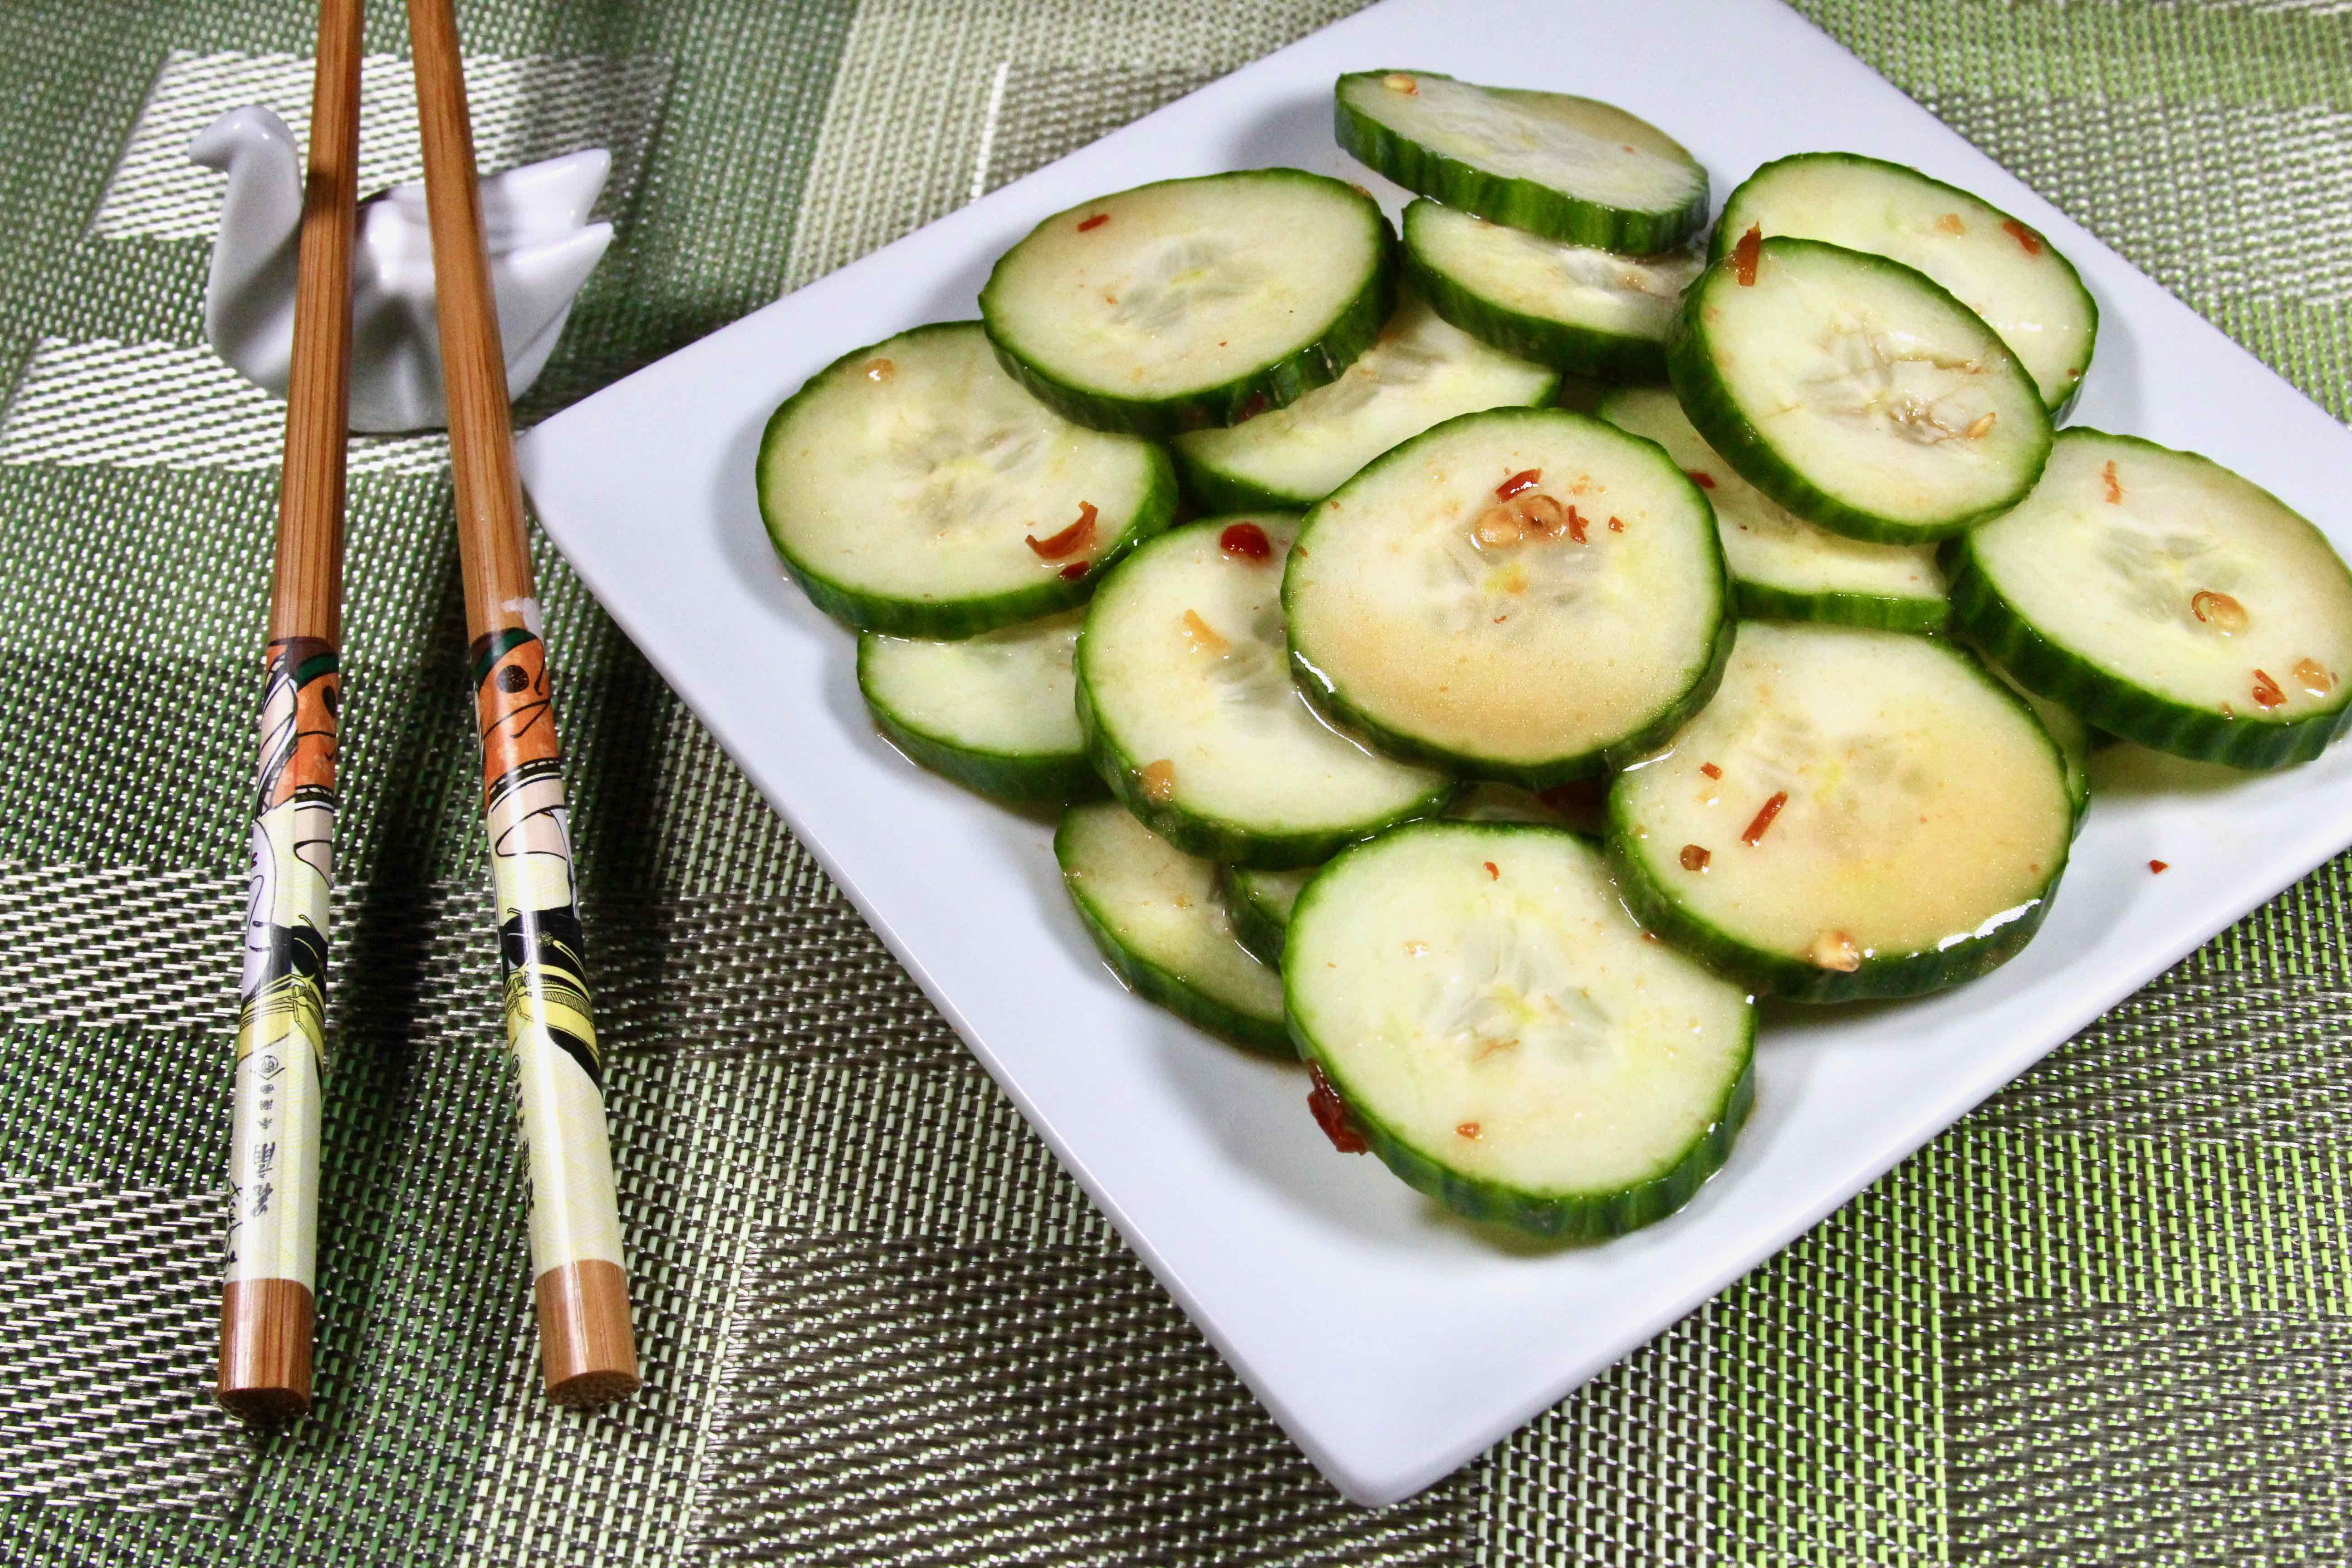 Japanese Restaurant Cucumber Salad